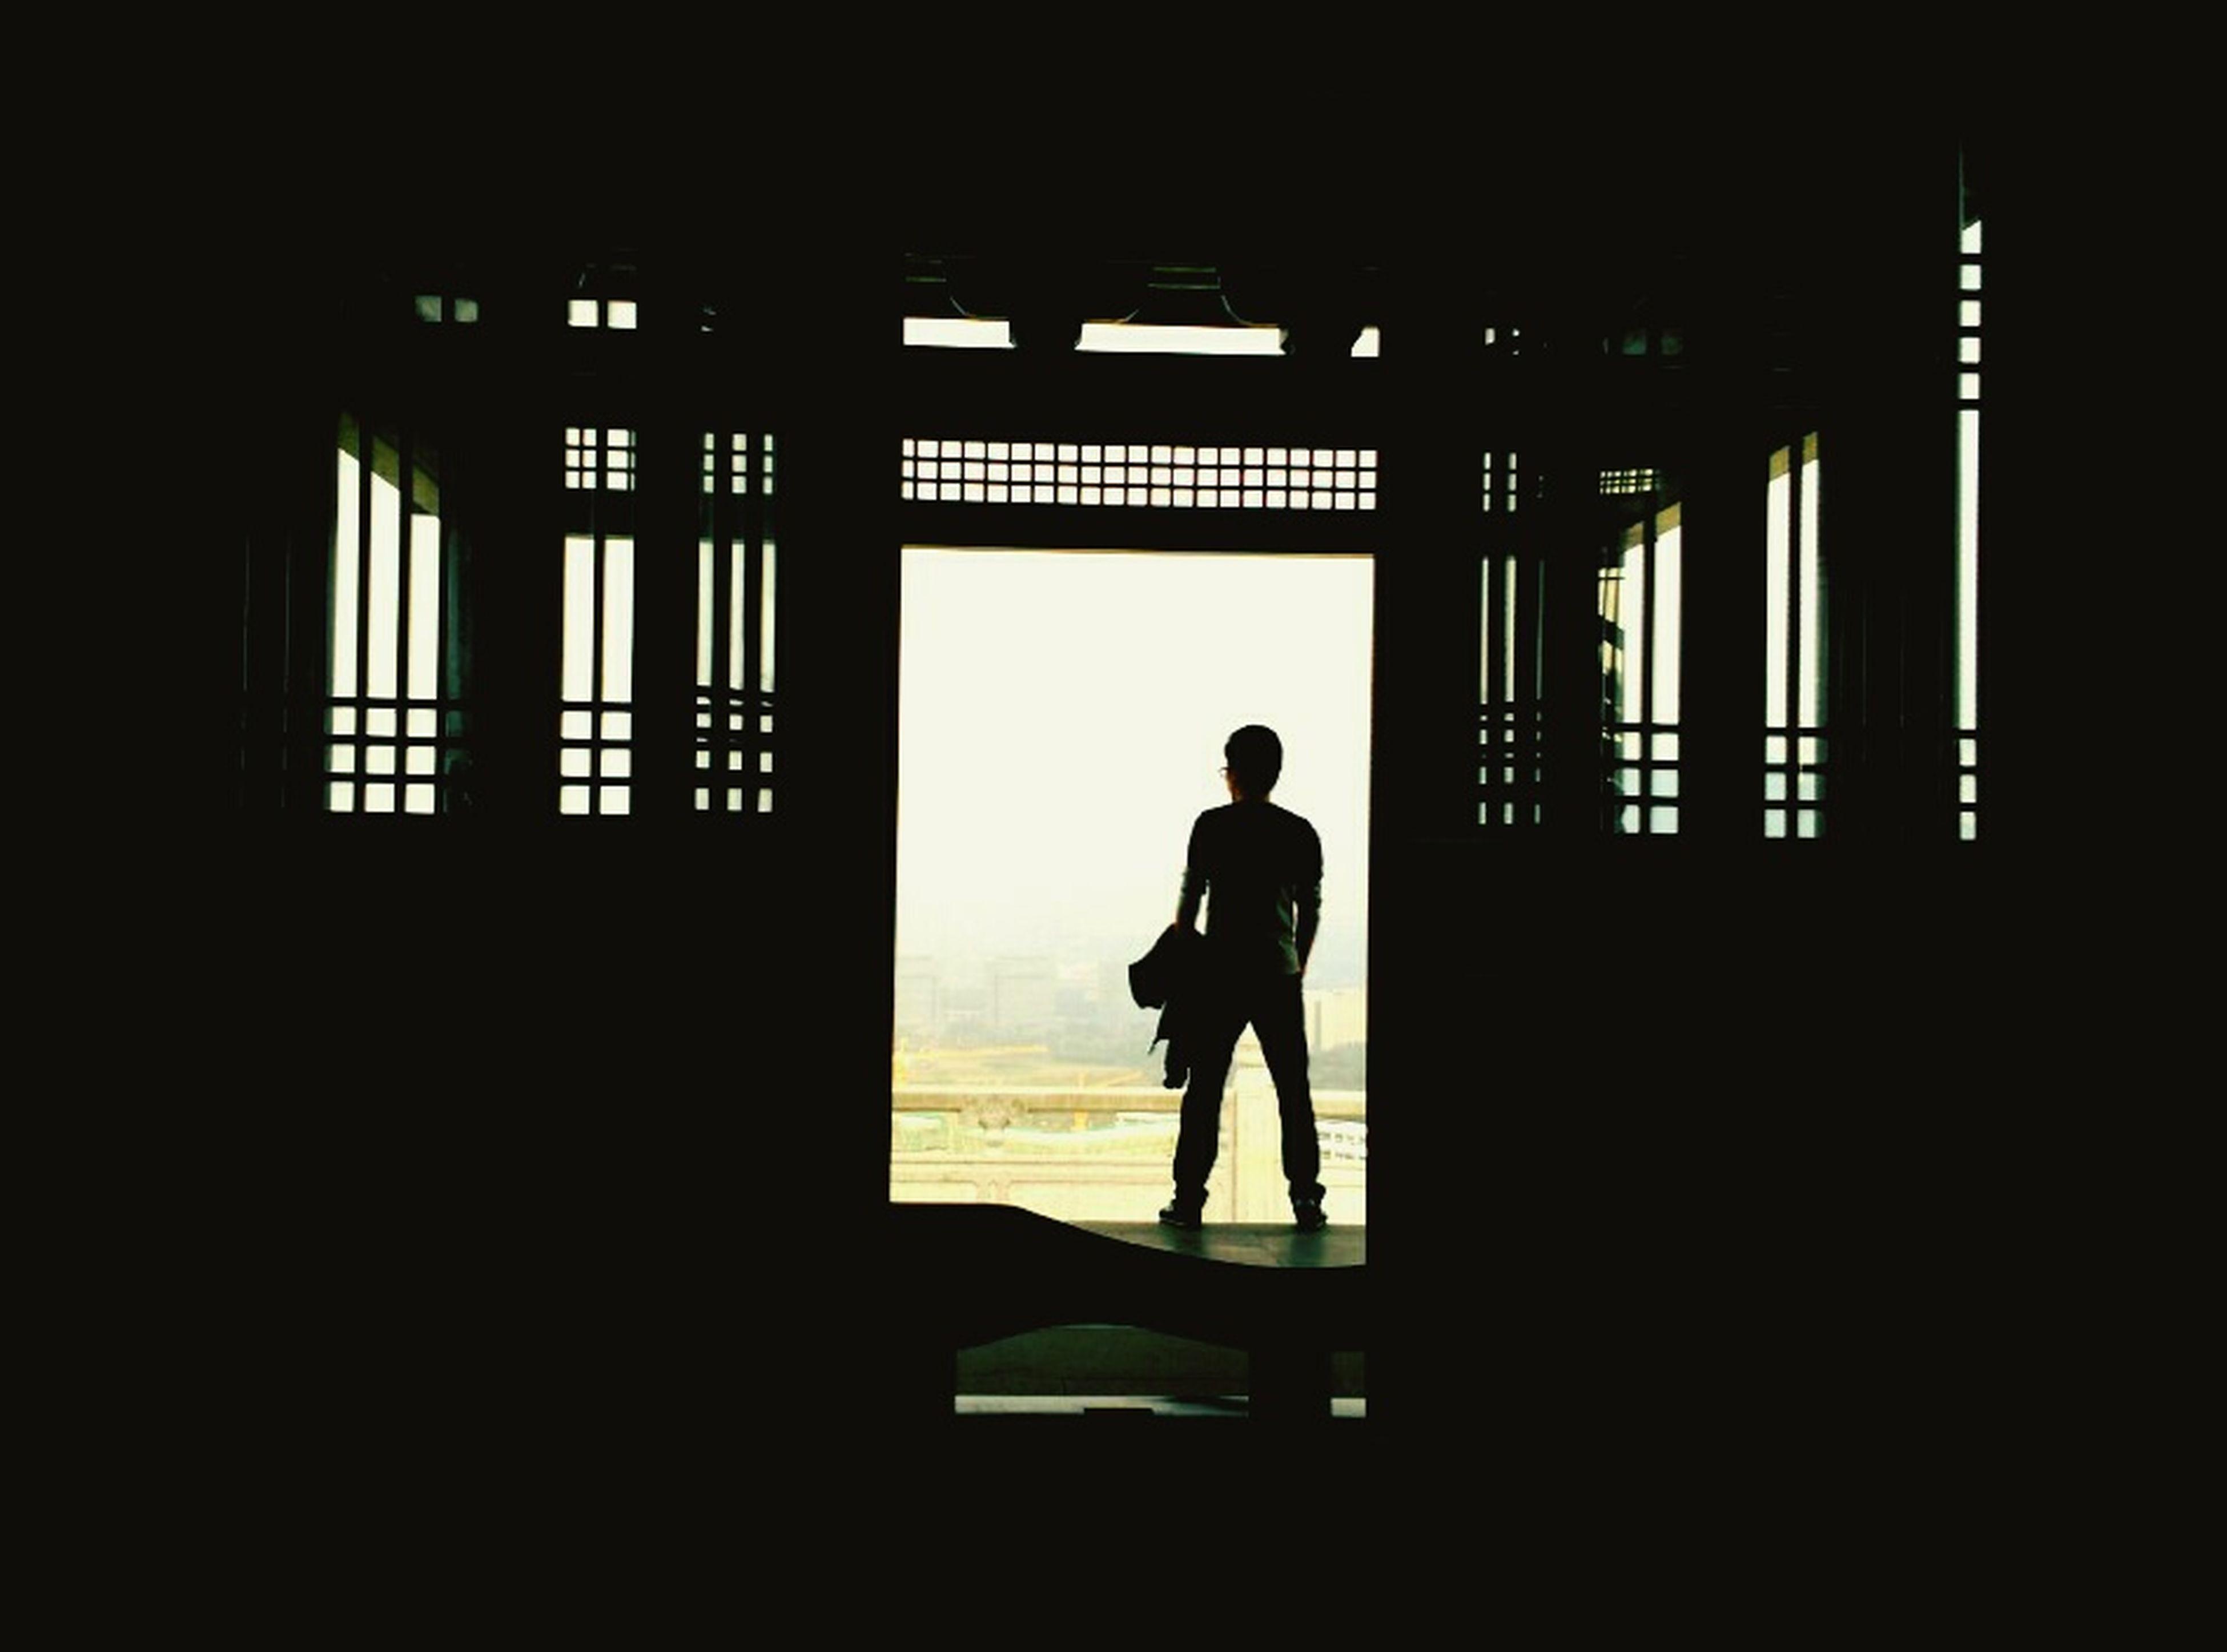 silhouette, standing, men, dark, full length, architecture, outline, interior, office building